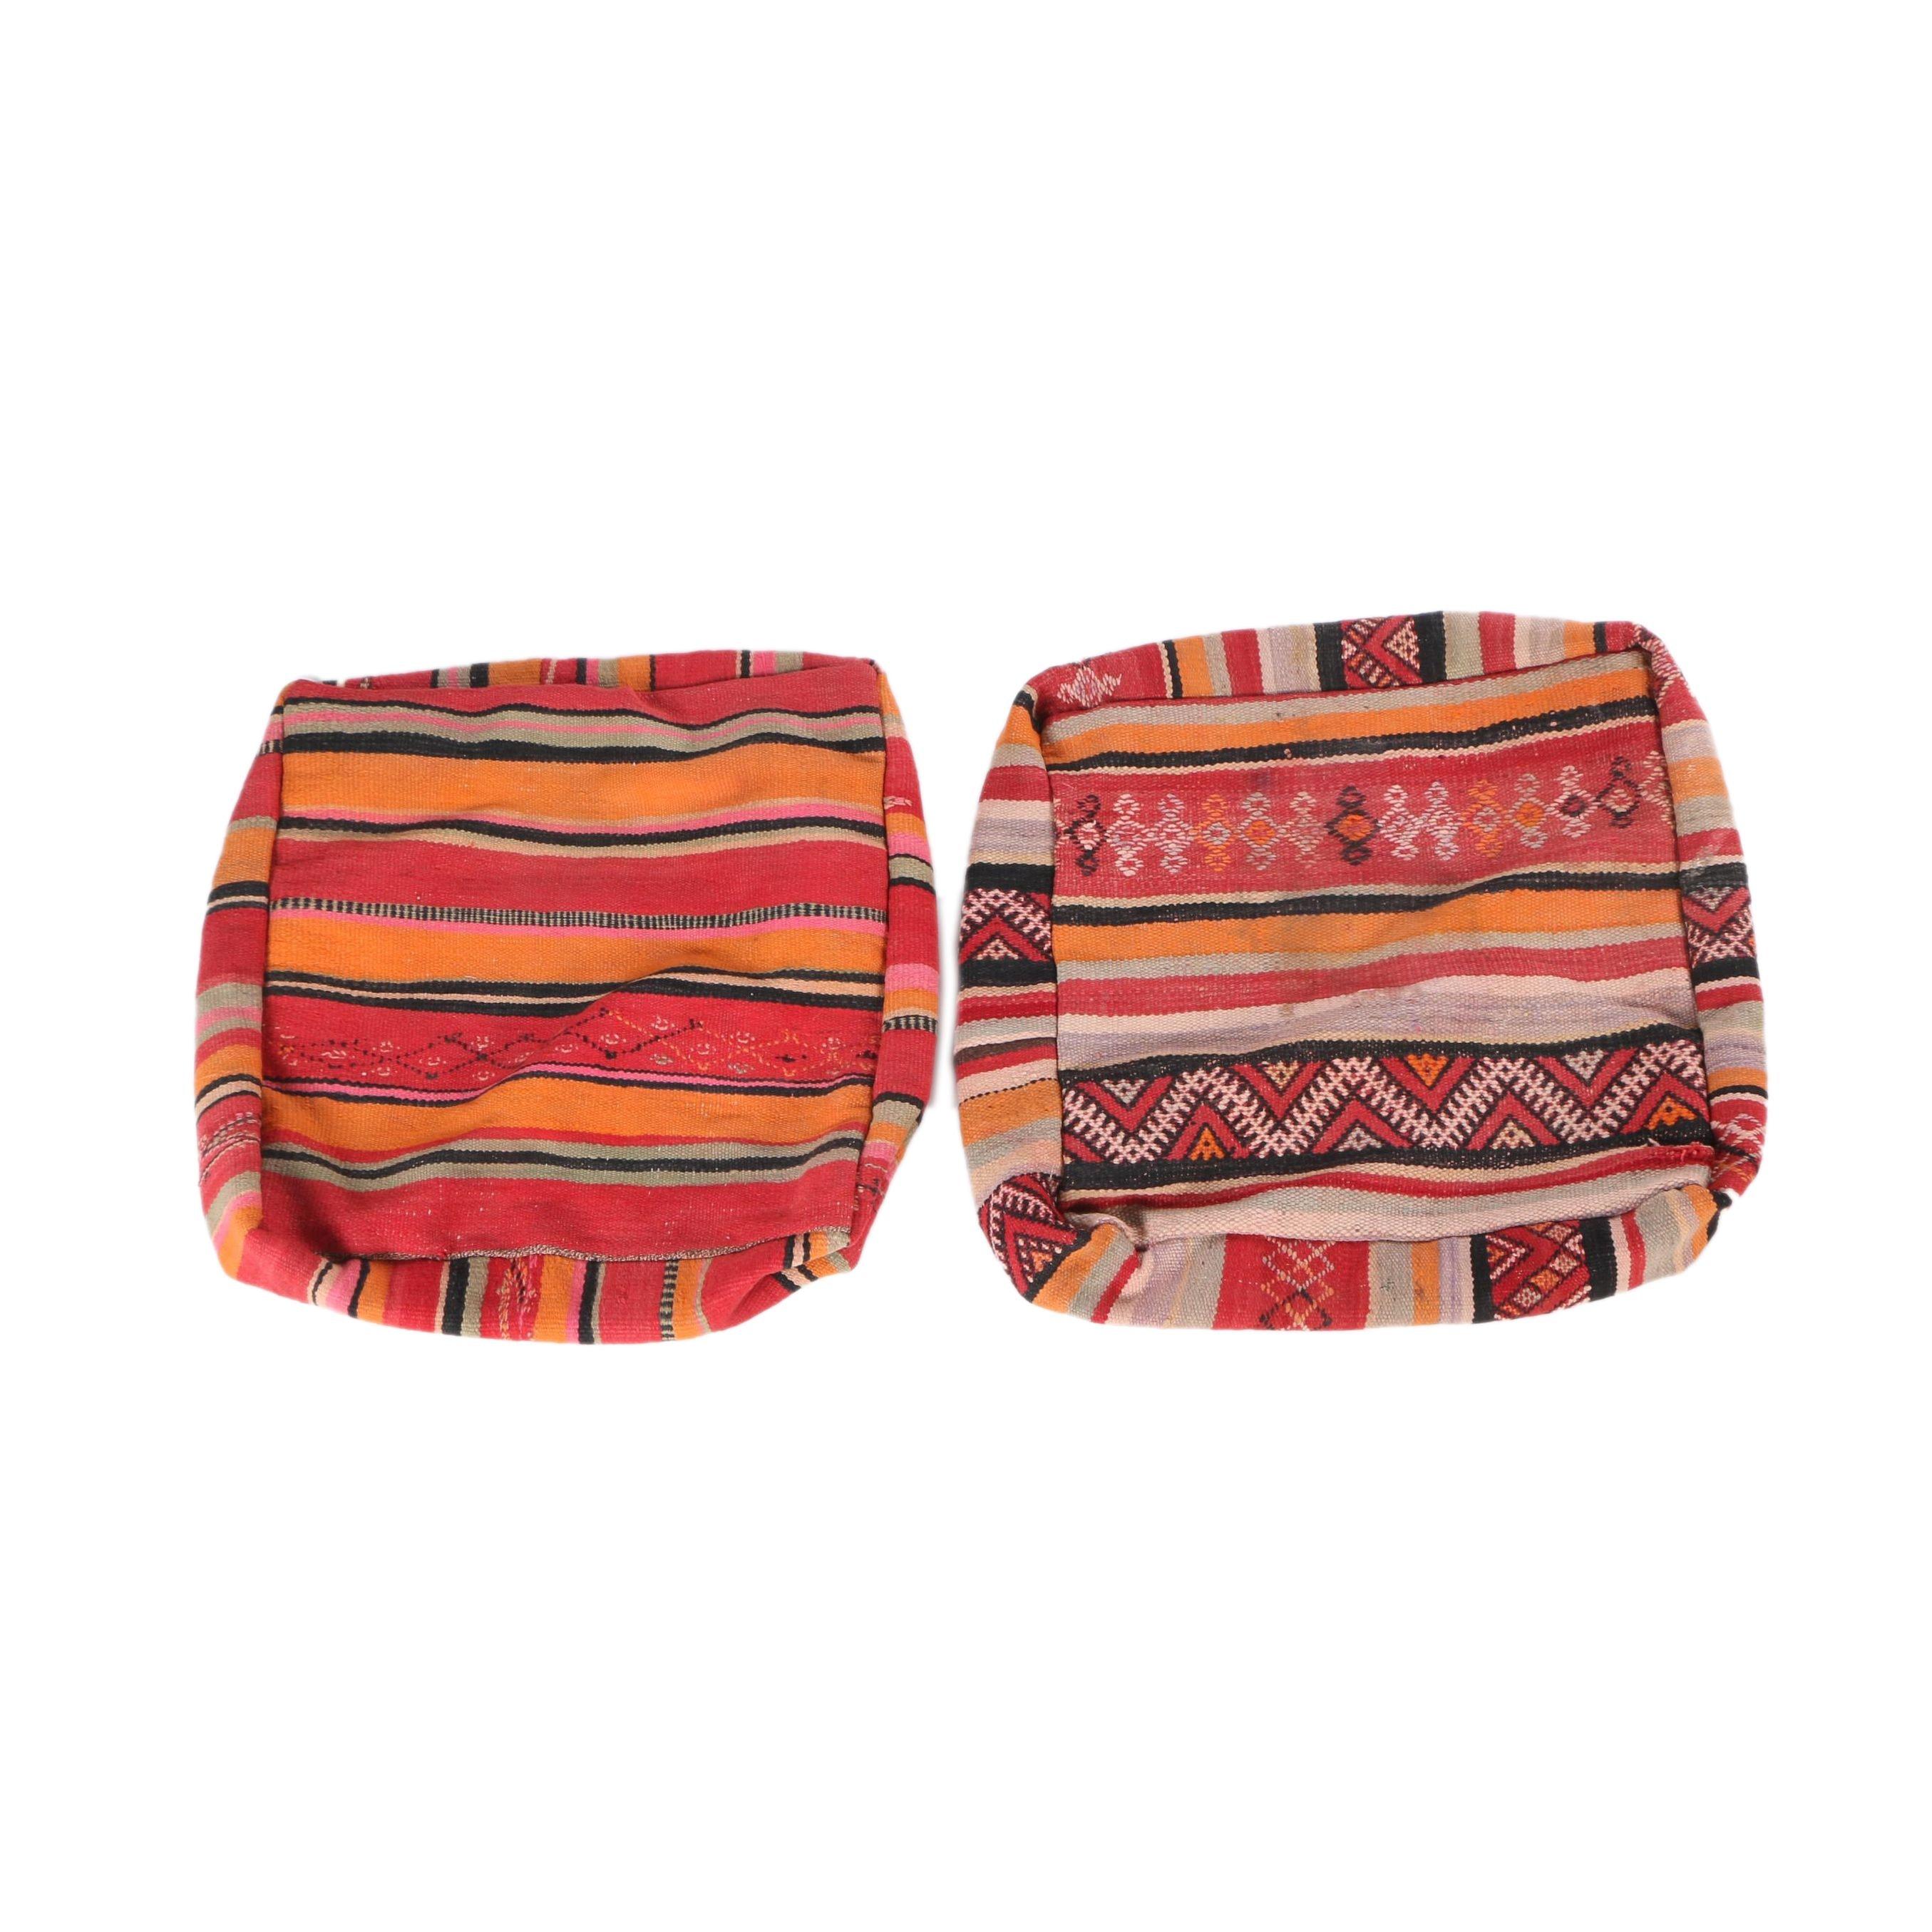 Pair of Handwoven Moroccan Berber Wool Rug Pillow Covers